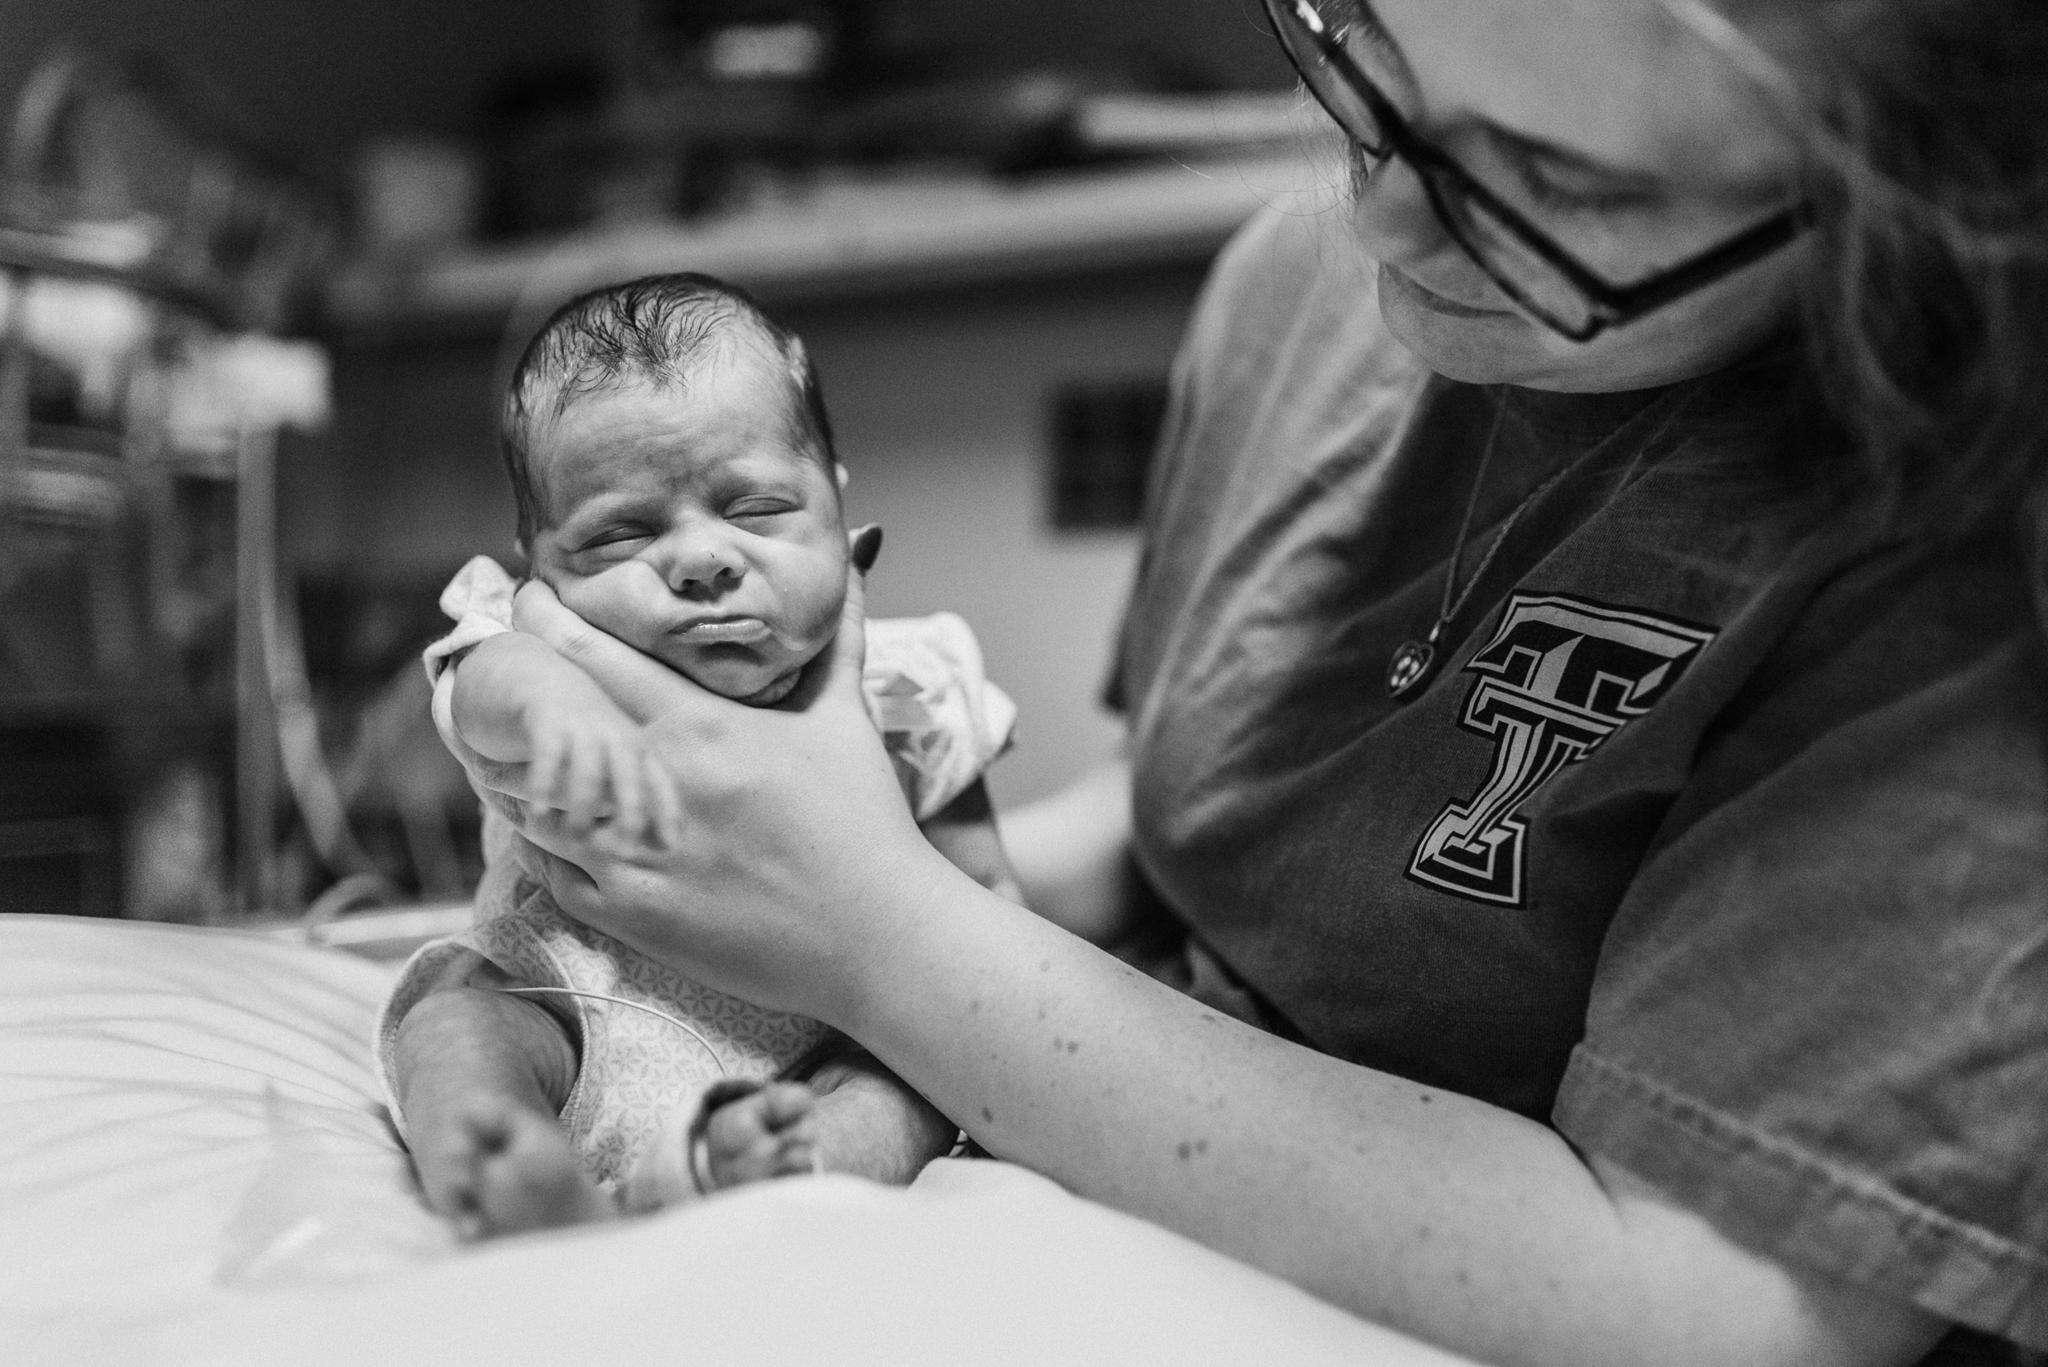 Round Rock Newborn Photographer_Emily Ingalls Photography_ Pflugerville Newborn Photographer_Family Photographer_Round Rock Photographer_Austin Photographer_Pflugerville Photographer_Hutto Photographer-14.jpg